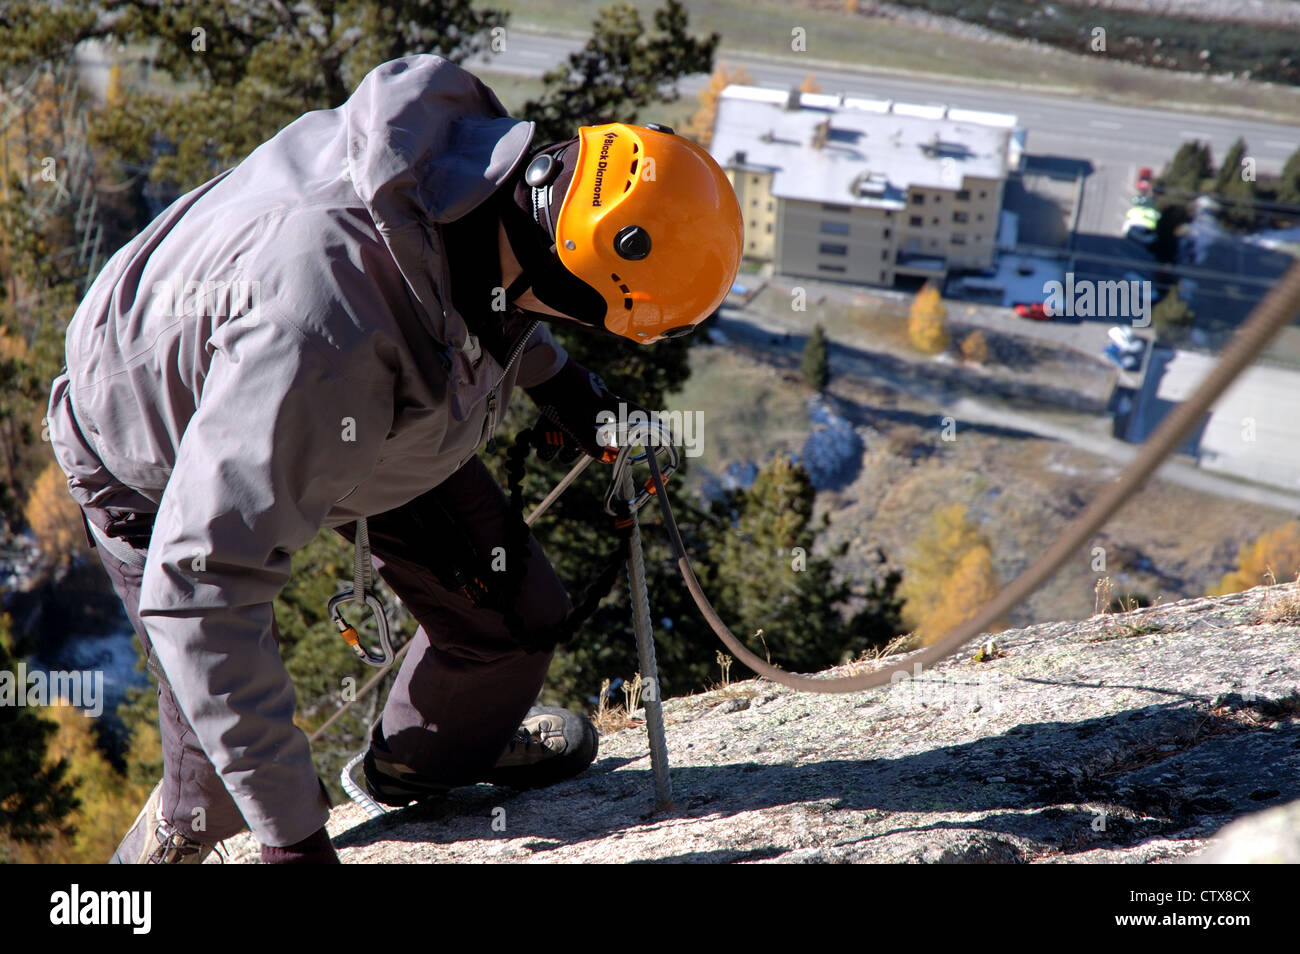 Klettersteig La Resgia : Bergsteiger auf la resgia ein klettersteig in pontresina engadin